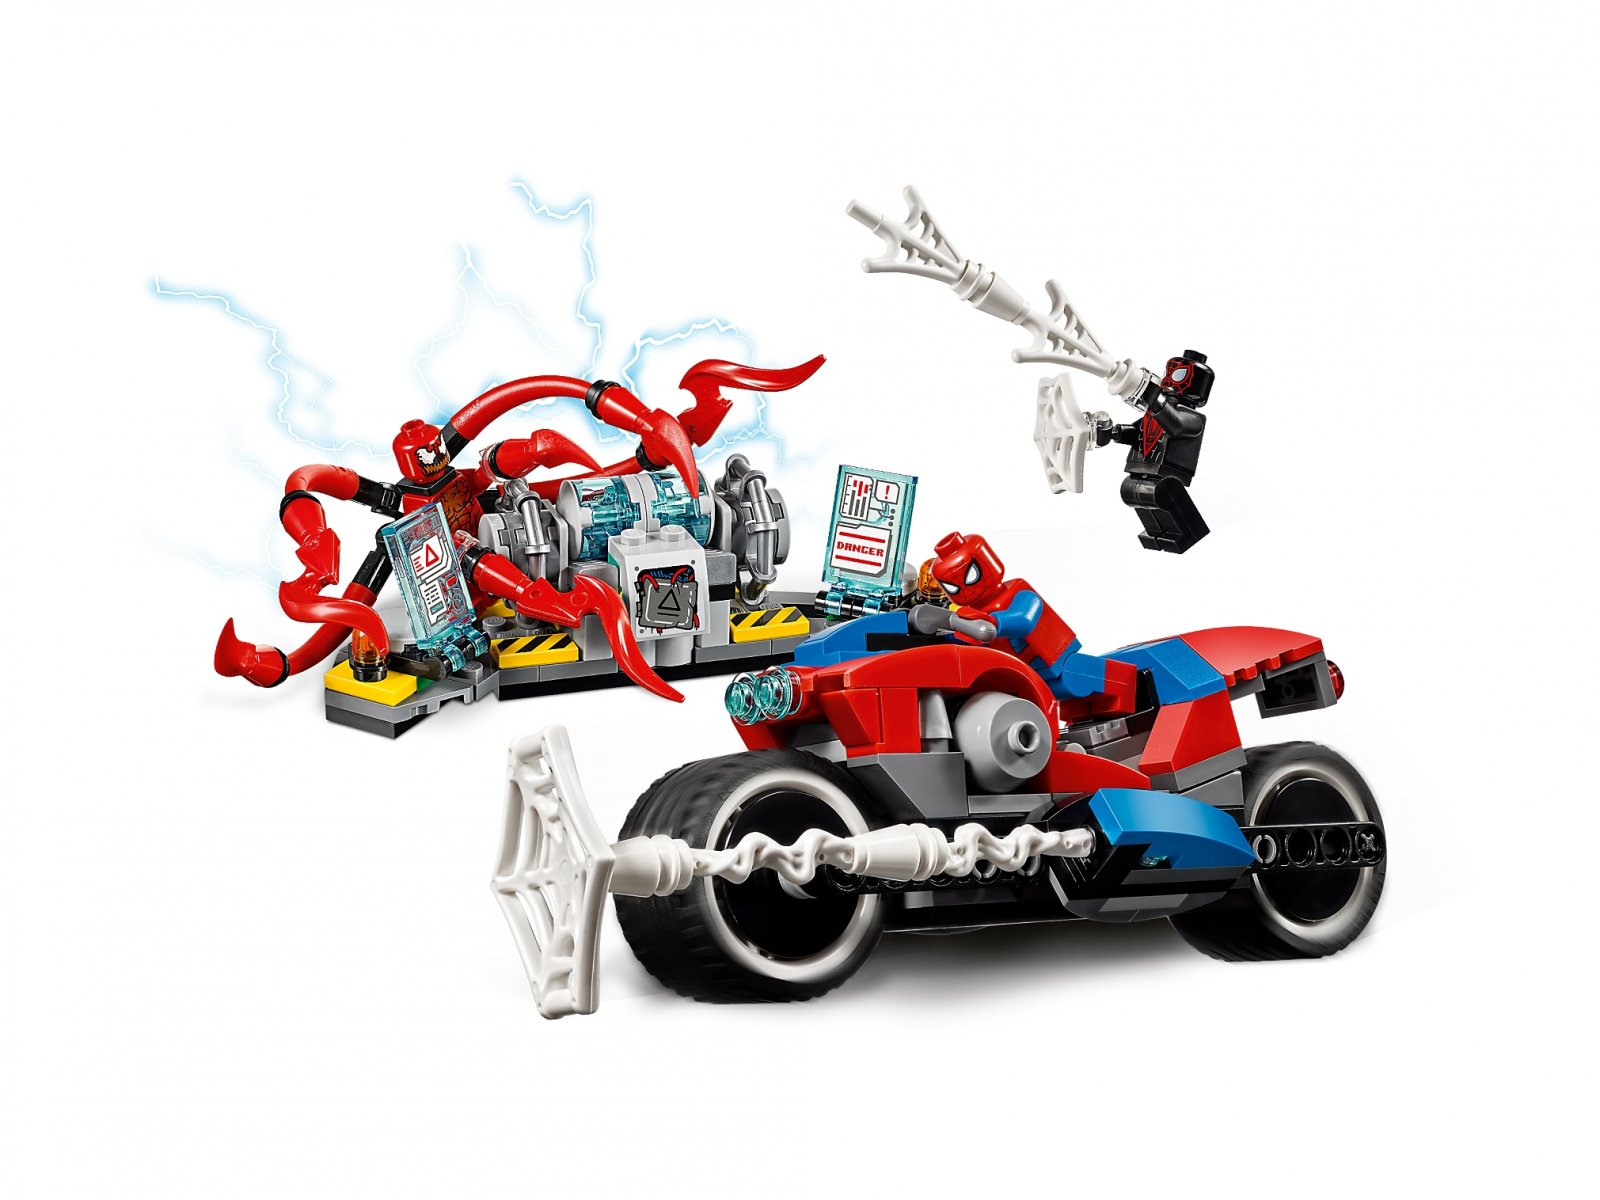 LEGO Marvel Super Heroes Pościg motocyklowy Spider-Mana